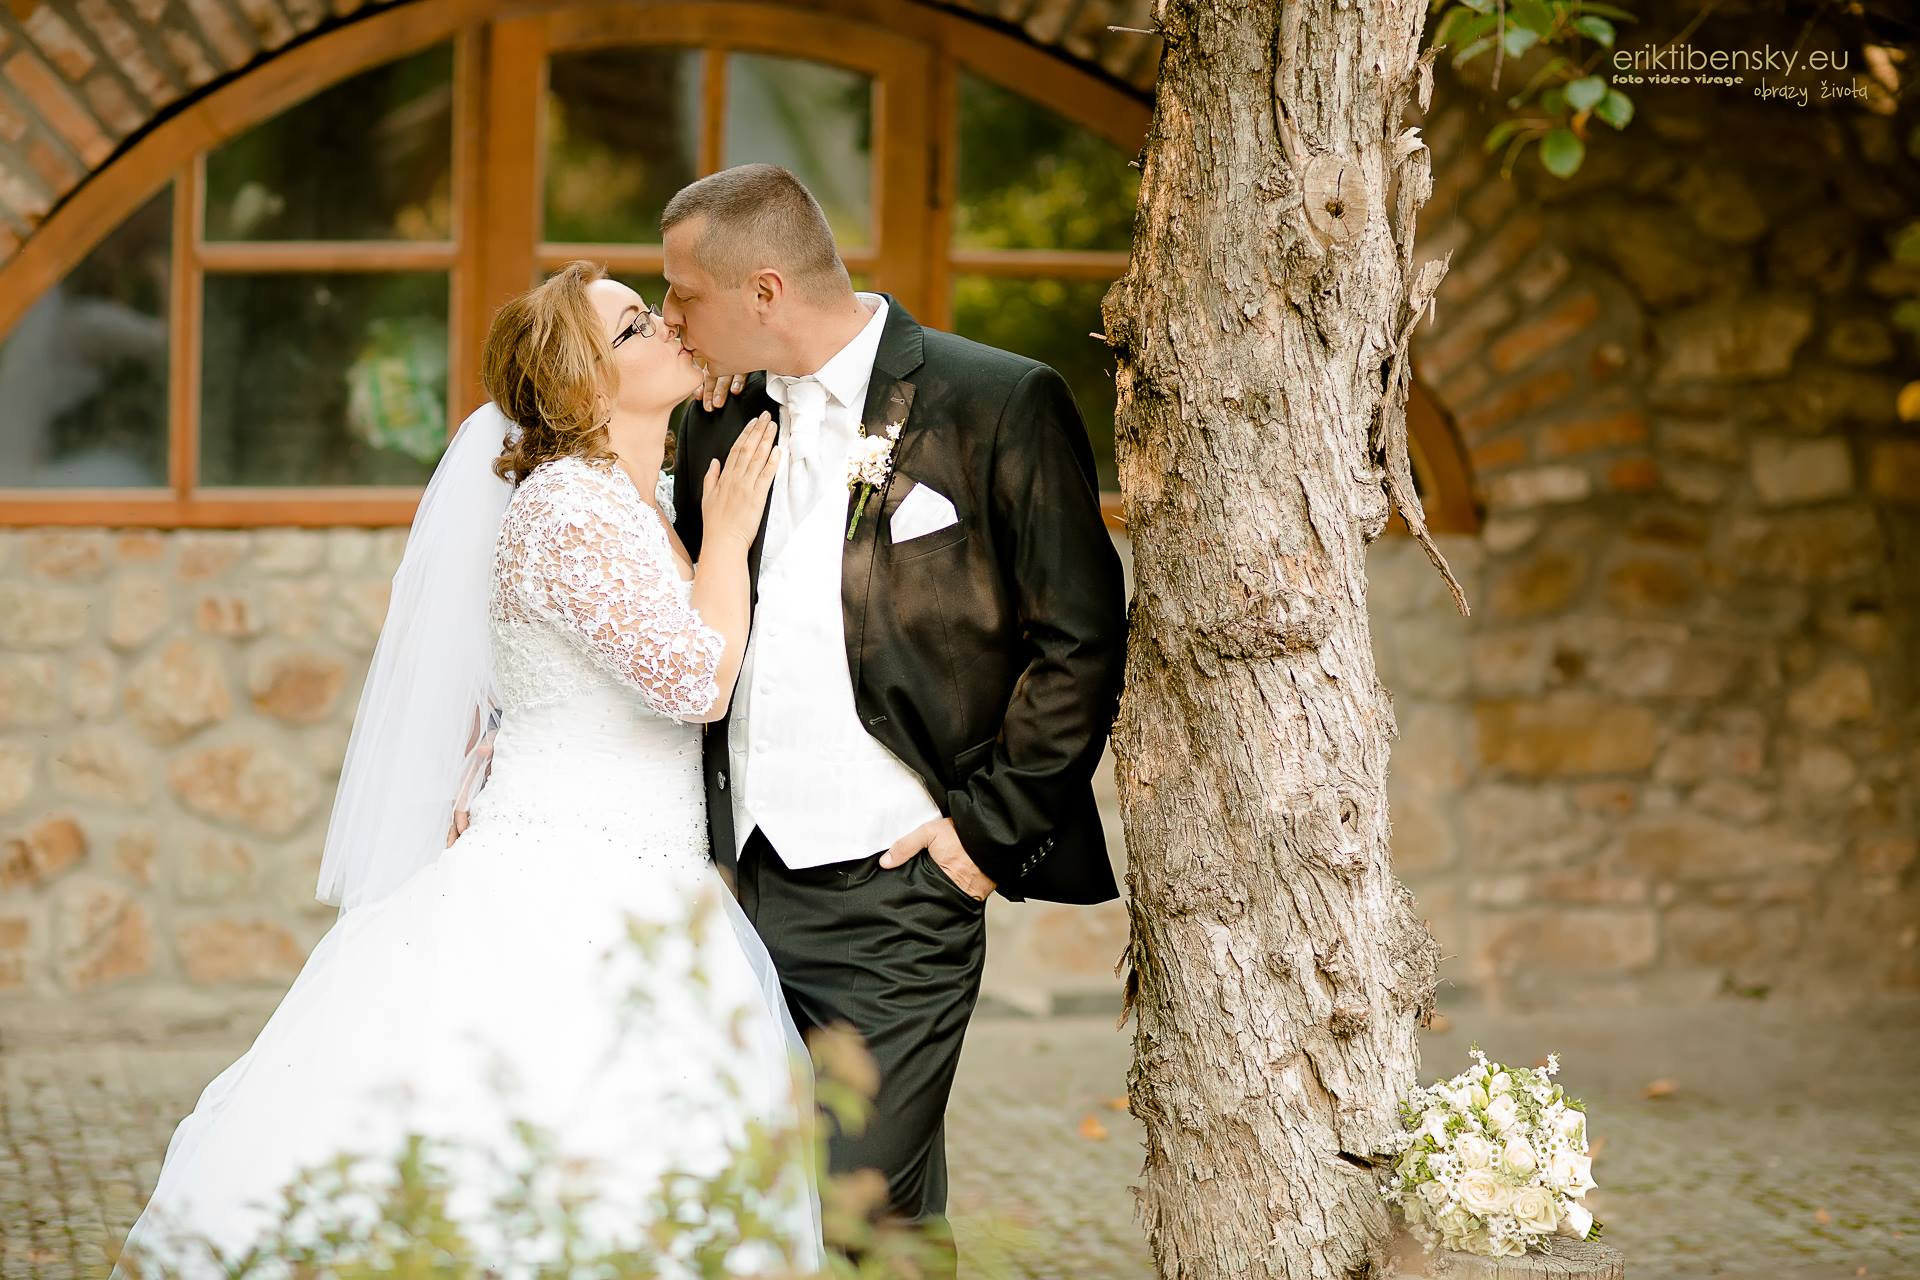 eriktibensky-eu-svadobny-fotograf-wedding-photographer-3032